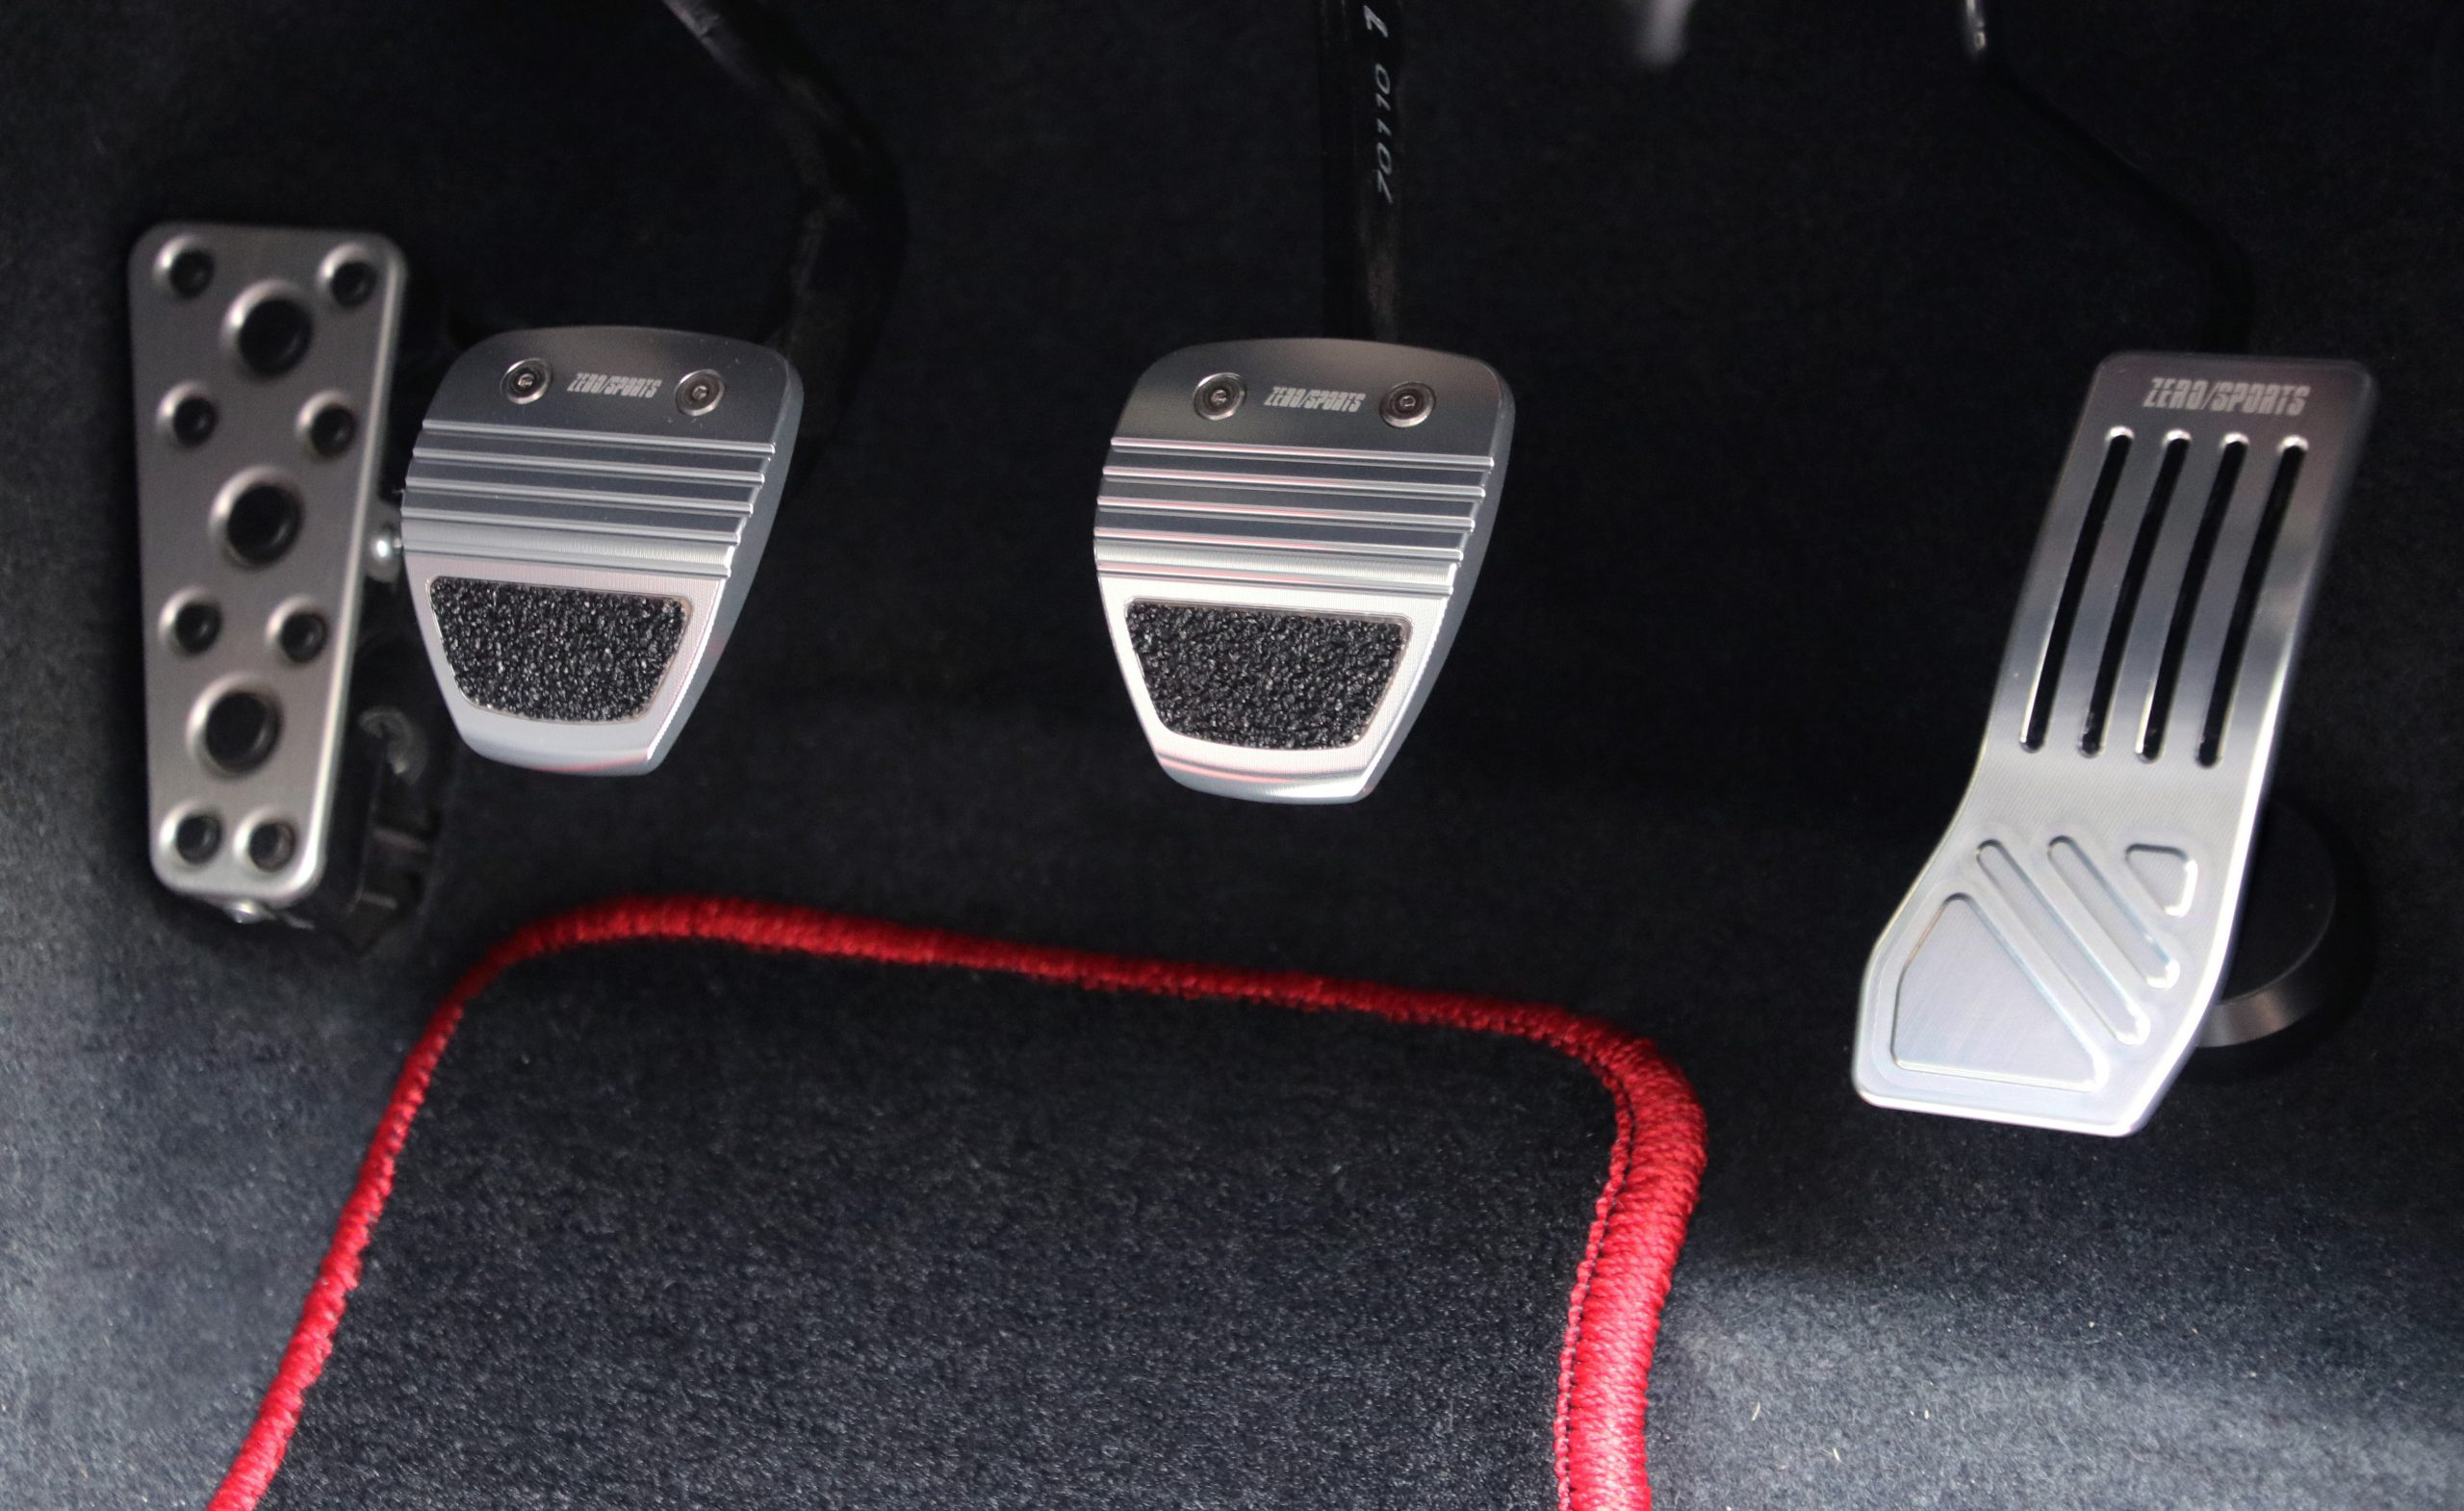 ZERO/SPORTSの新製品「アクセルペダル」「ブレーキ&クラッチペダル」「ブレーキペダル」